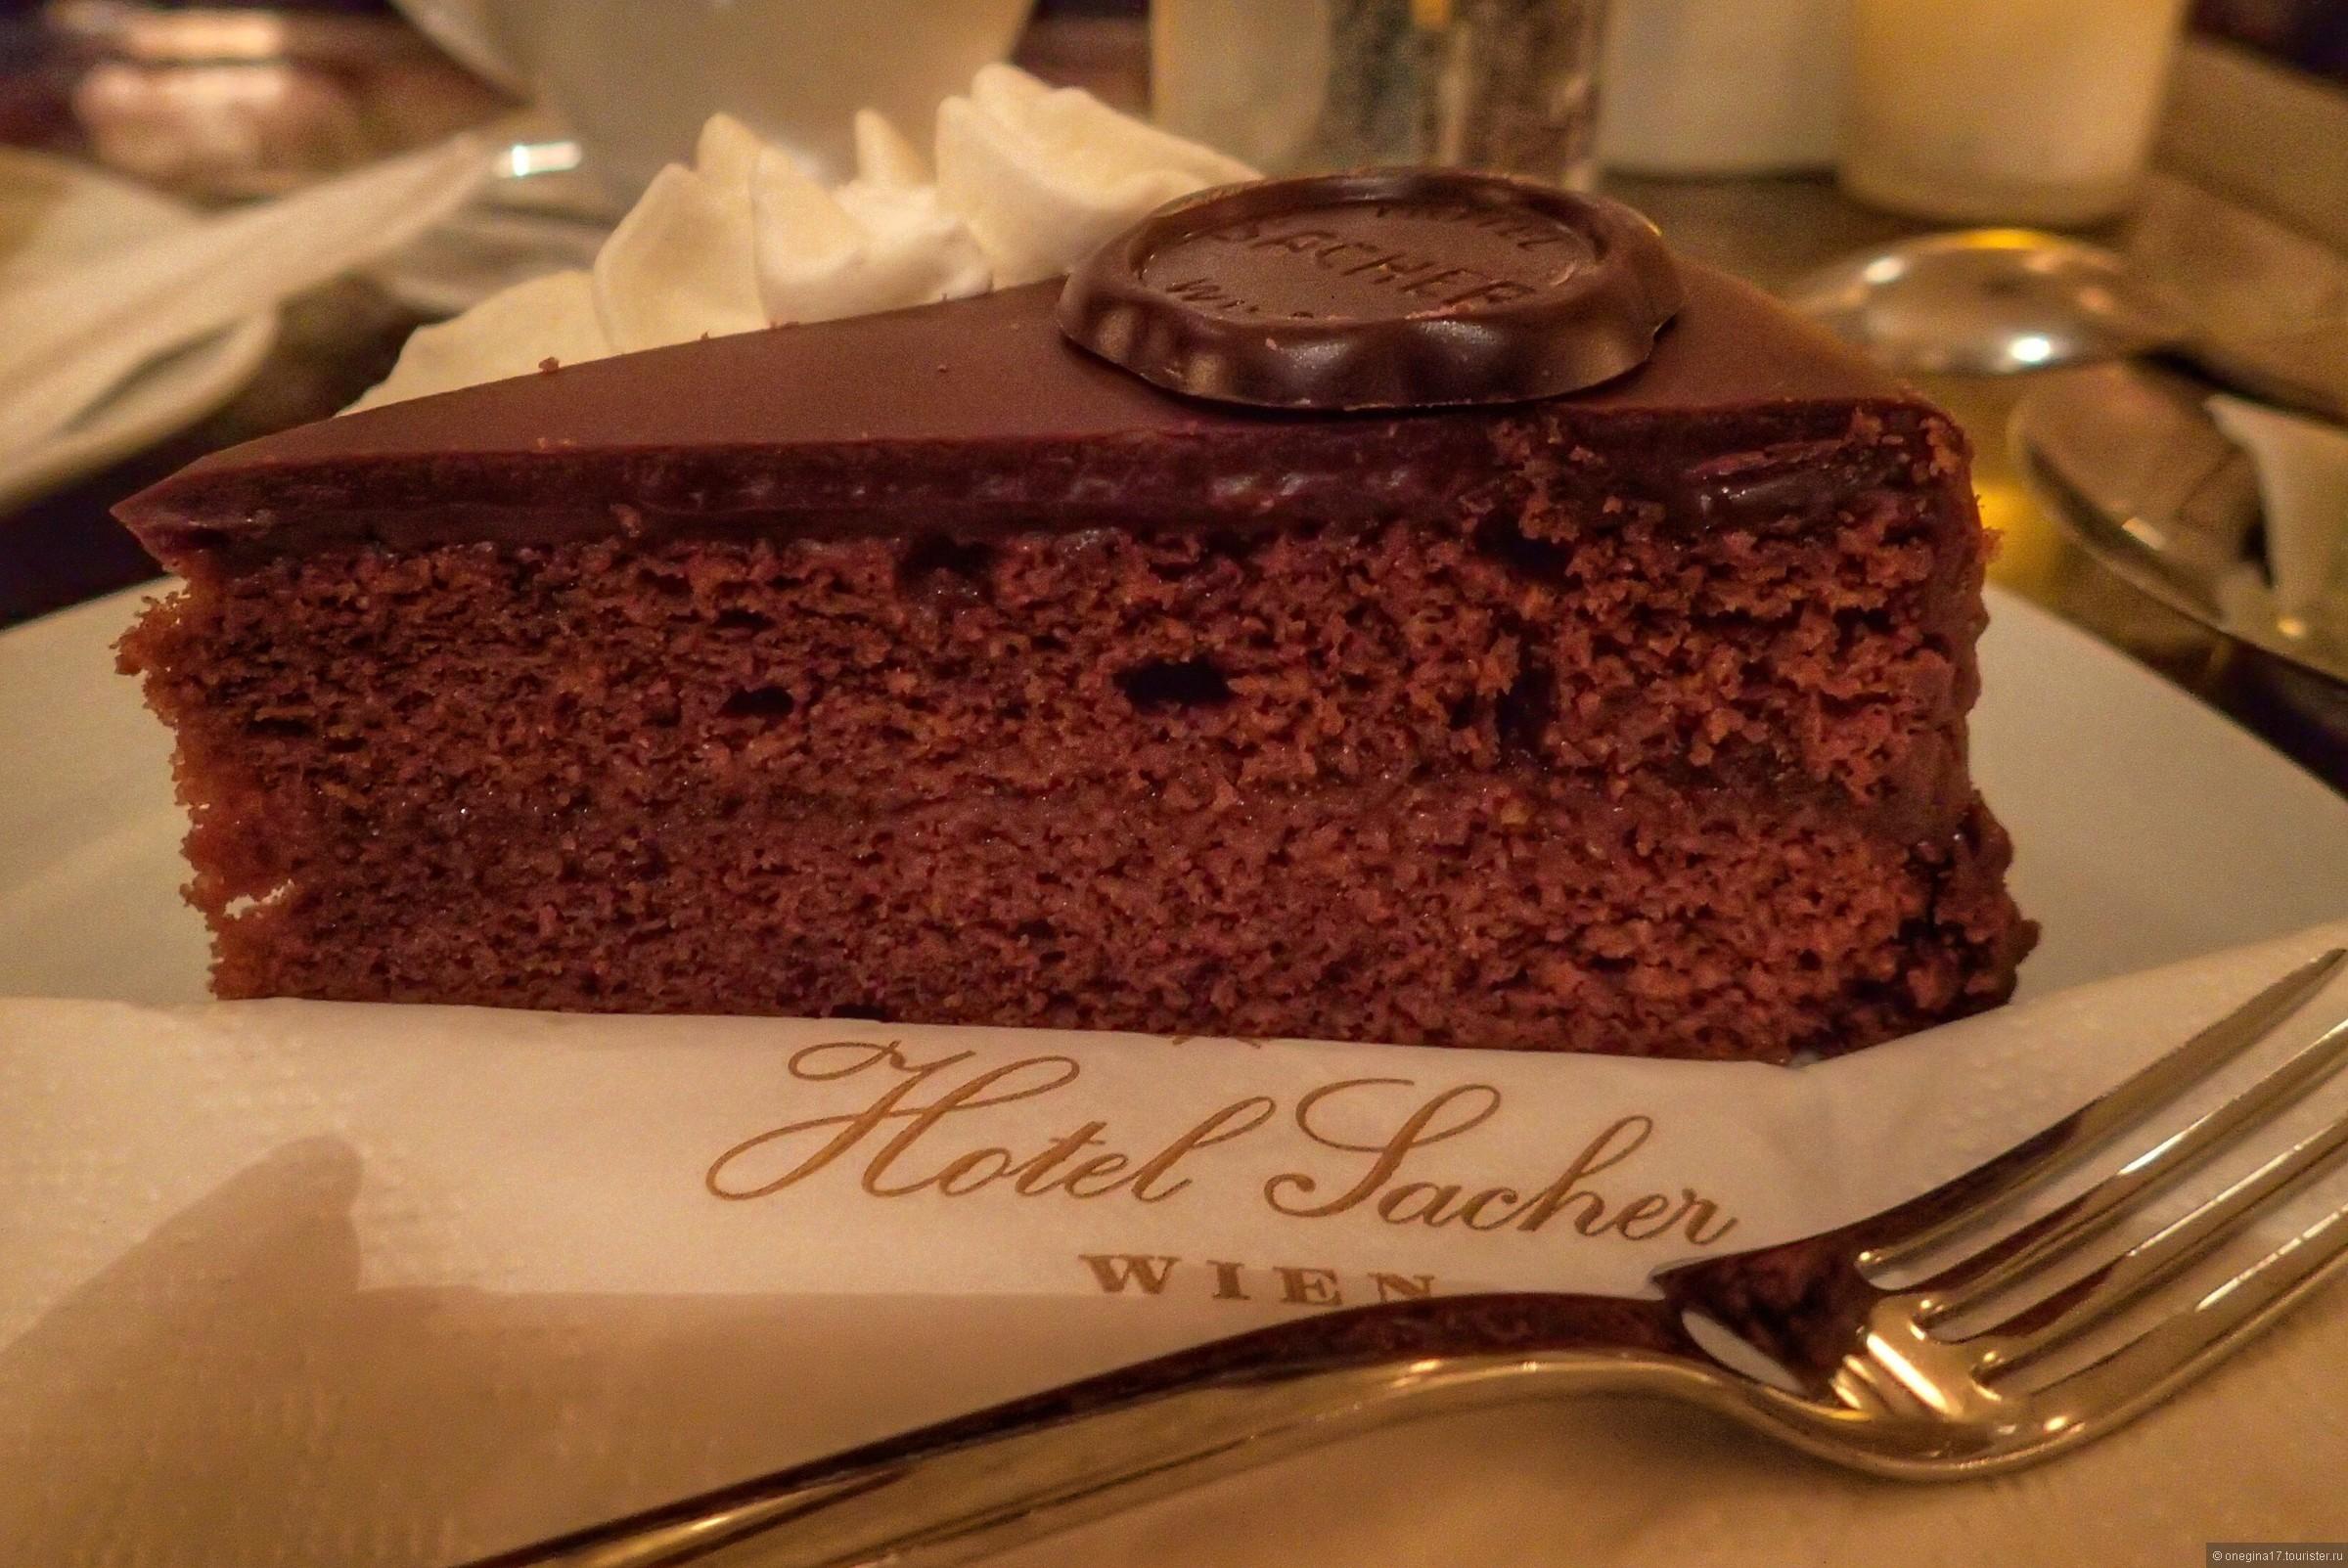 Захер торт настоящий